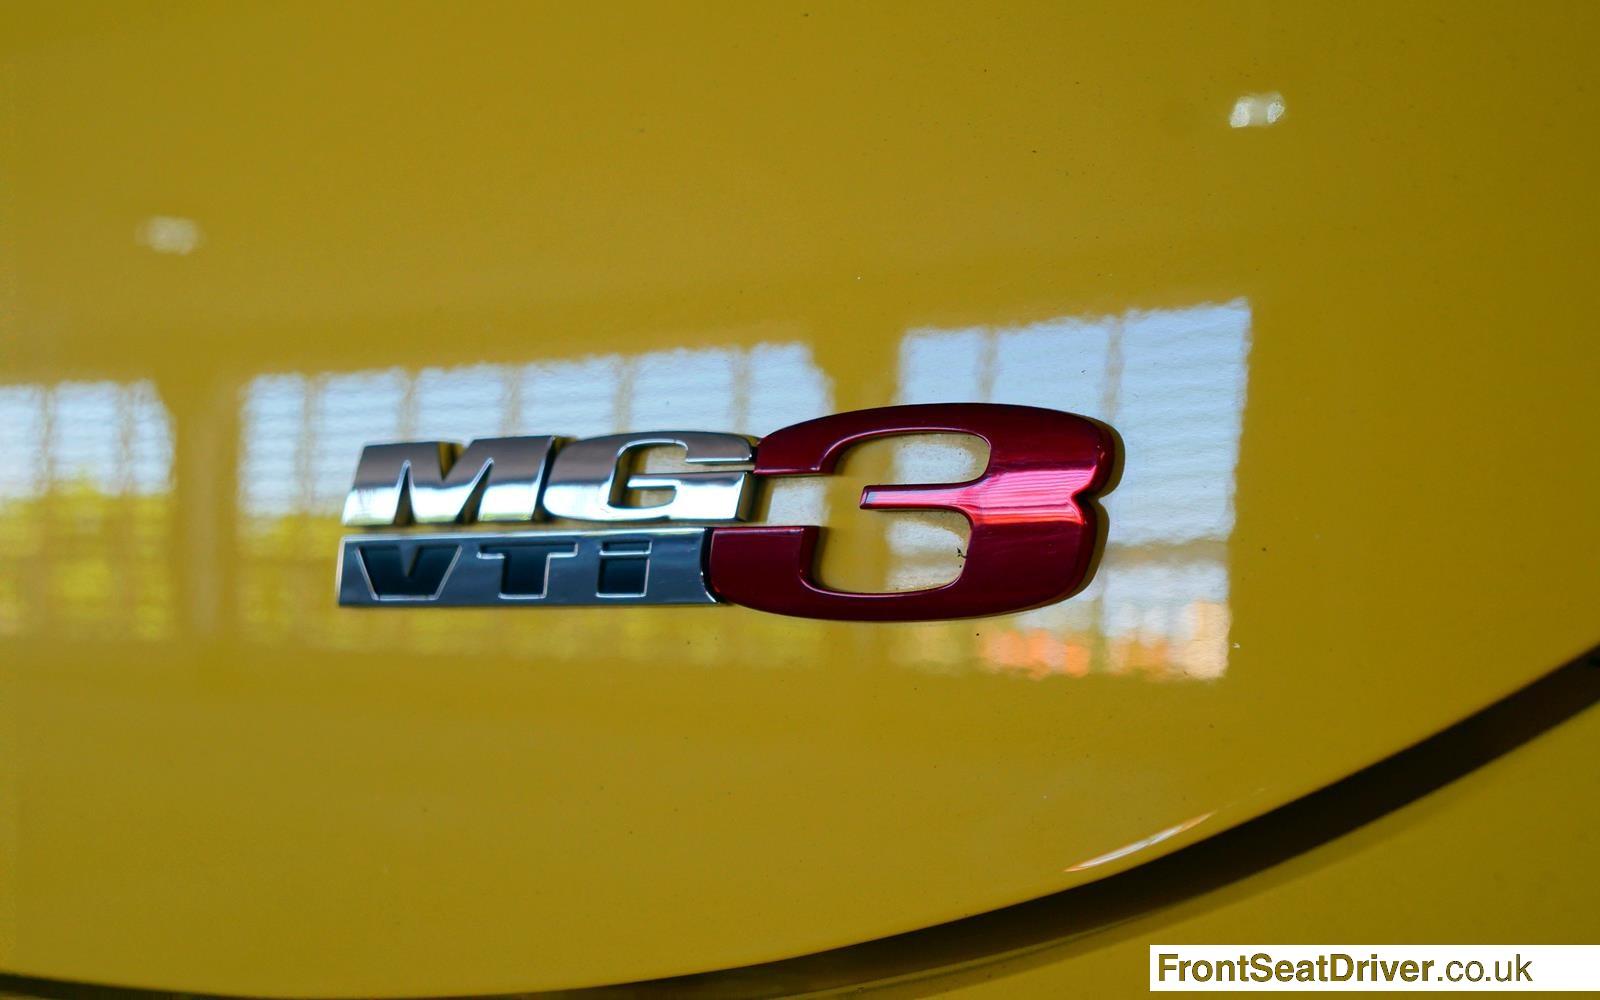 MG 3 2014 Badge Detail Phil Huff FrontSeatDriver.co.uk